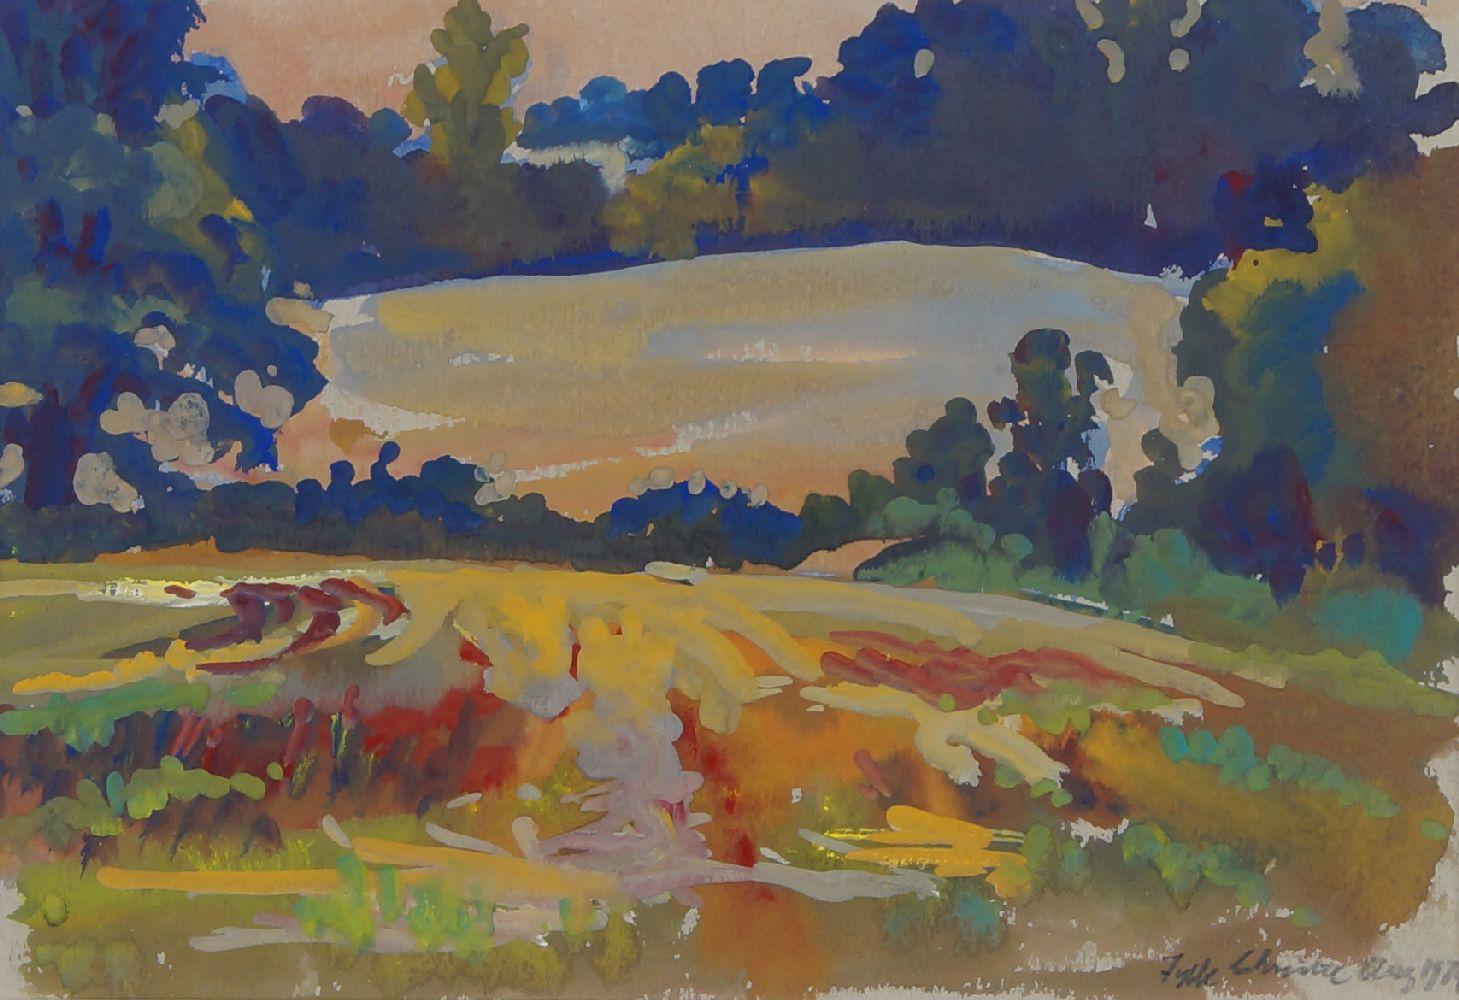 Fyffe Christie, British 1918-1979- Fields Eysford; gouache, signed and dated 1974, 17x24.5cm: